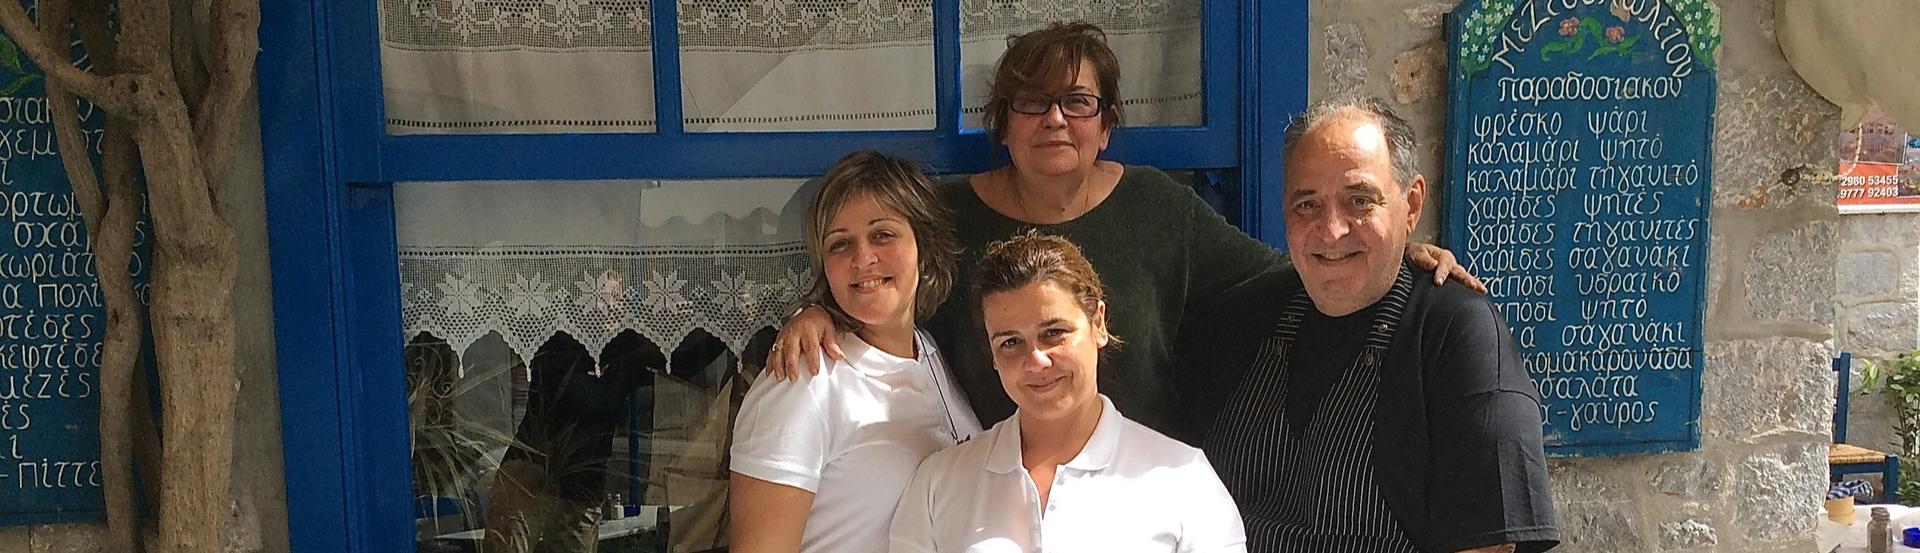 (left) Christiana Kitsou, (right) Takis Kitsos, (top) Matina Kitsou, (bottom) Marianna Rousi